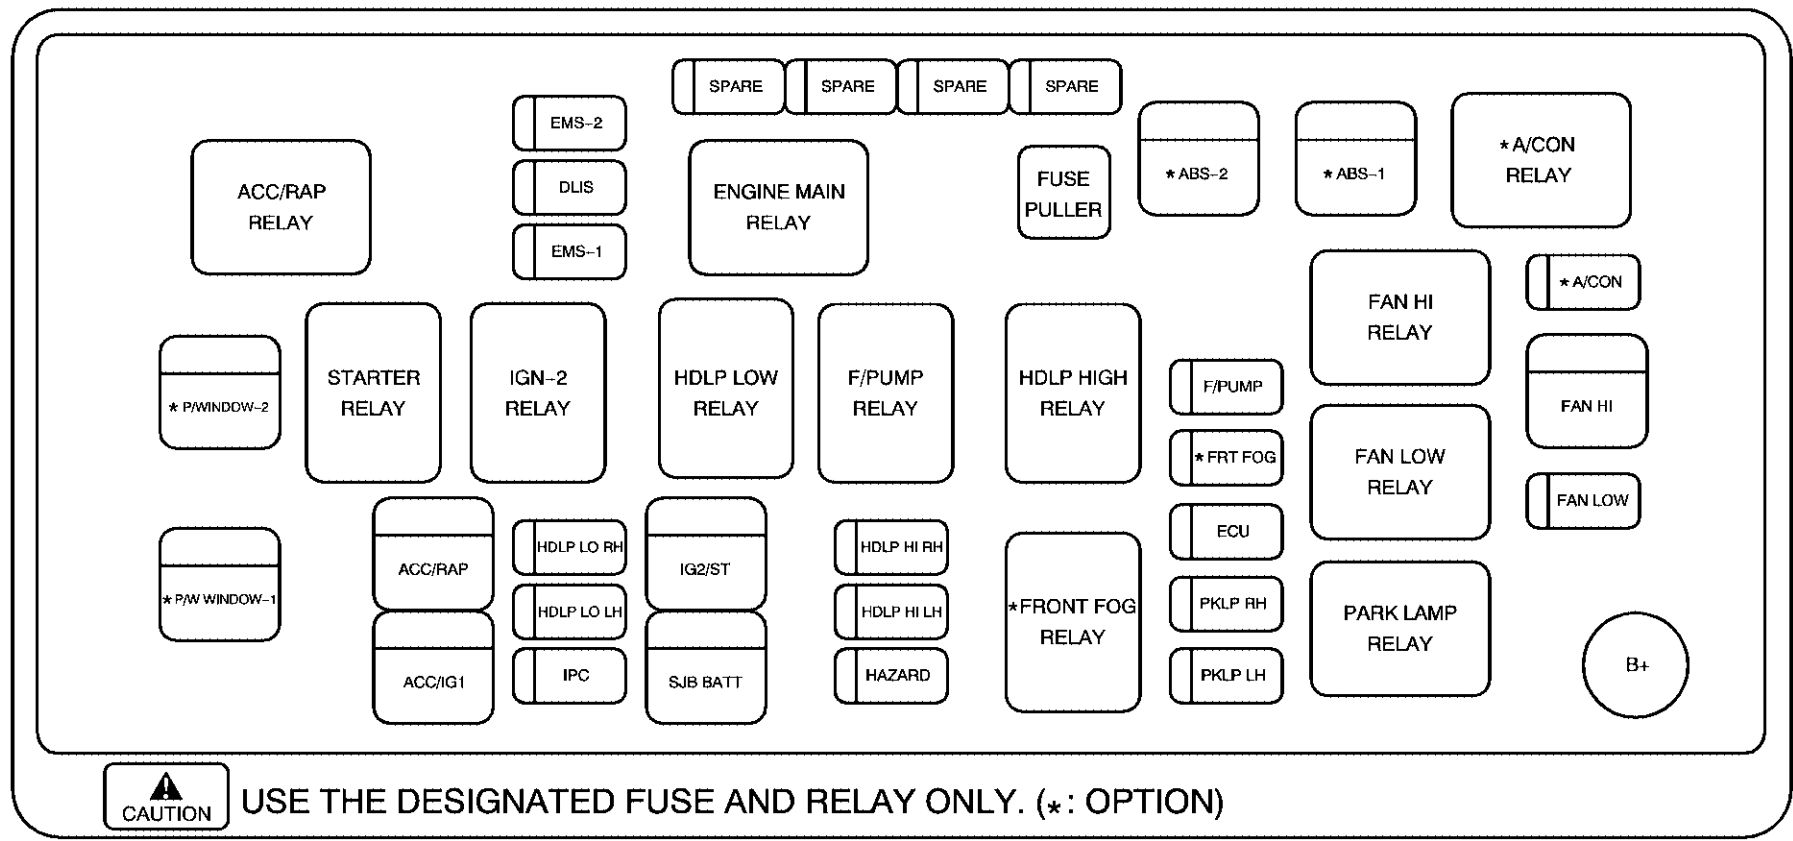 2004 chevy aveo fuse box diagram